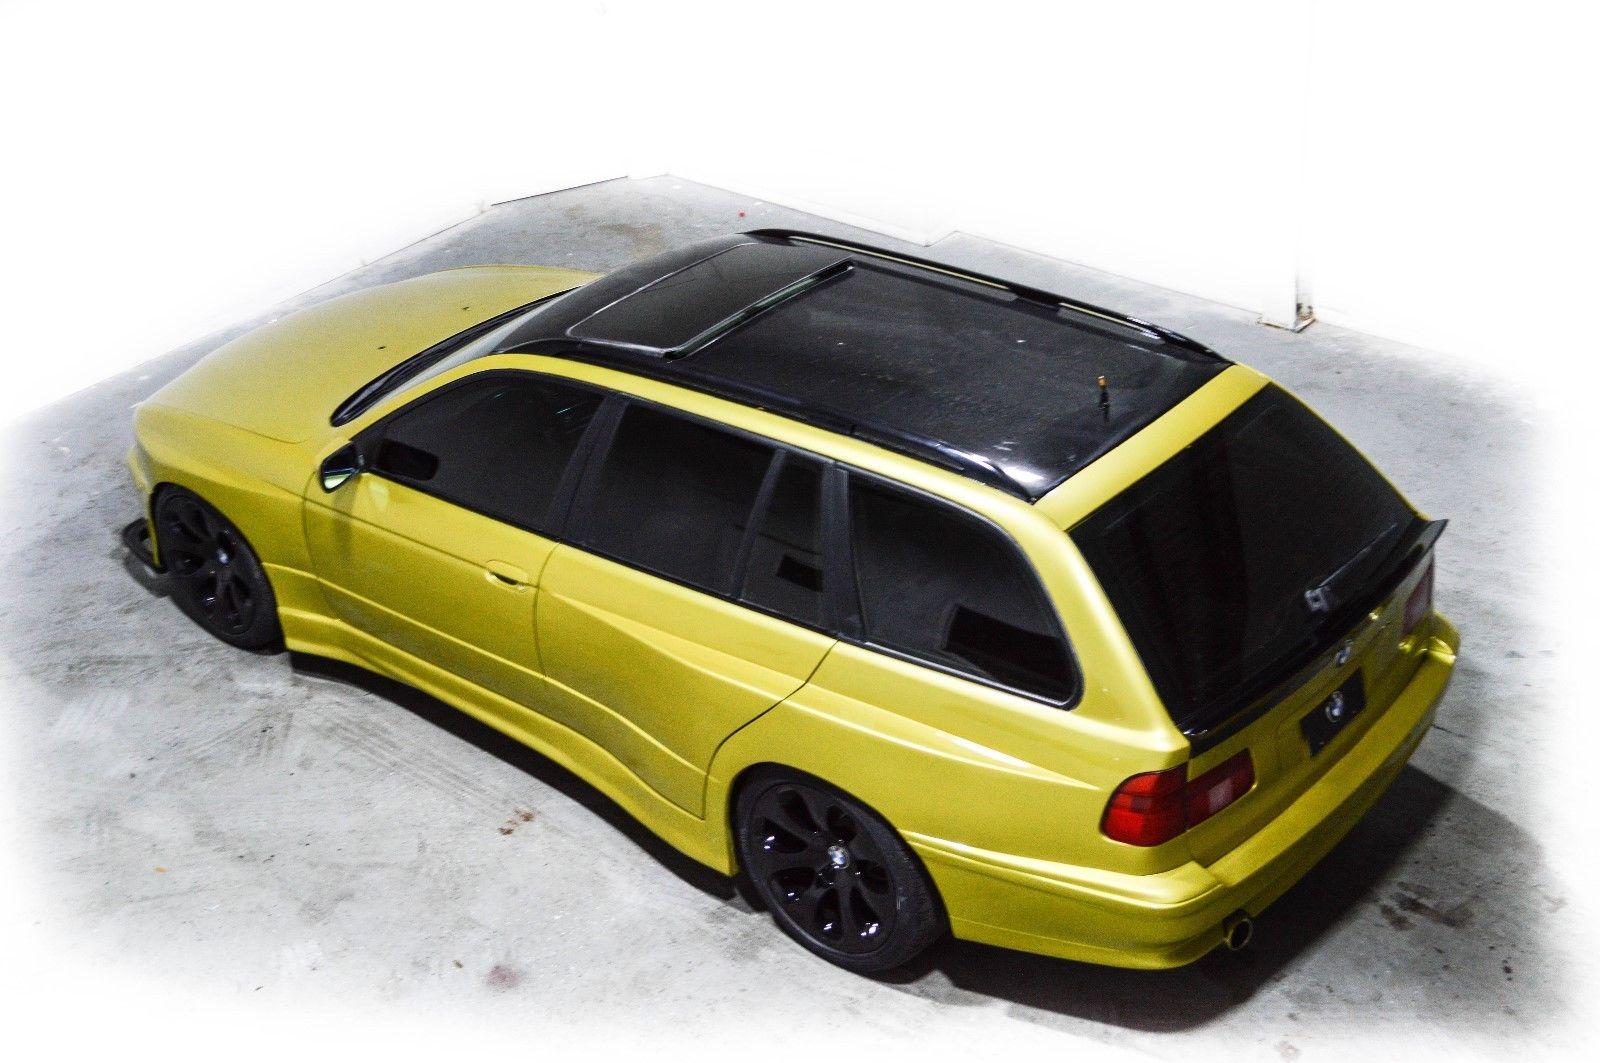 hight resolution of widebody wagon 2000 bmw 540i 6 speed